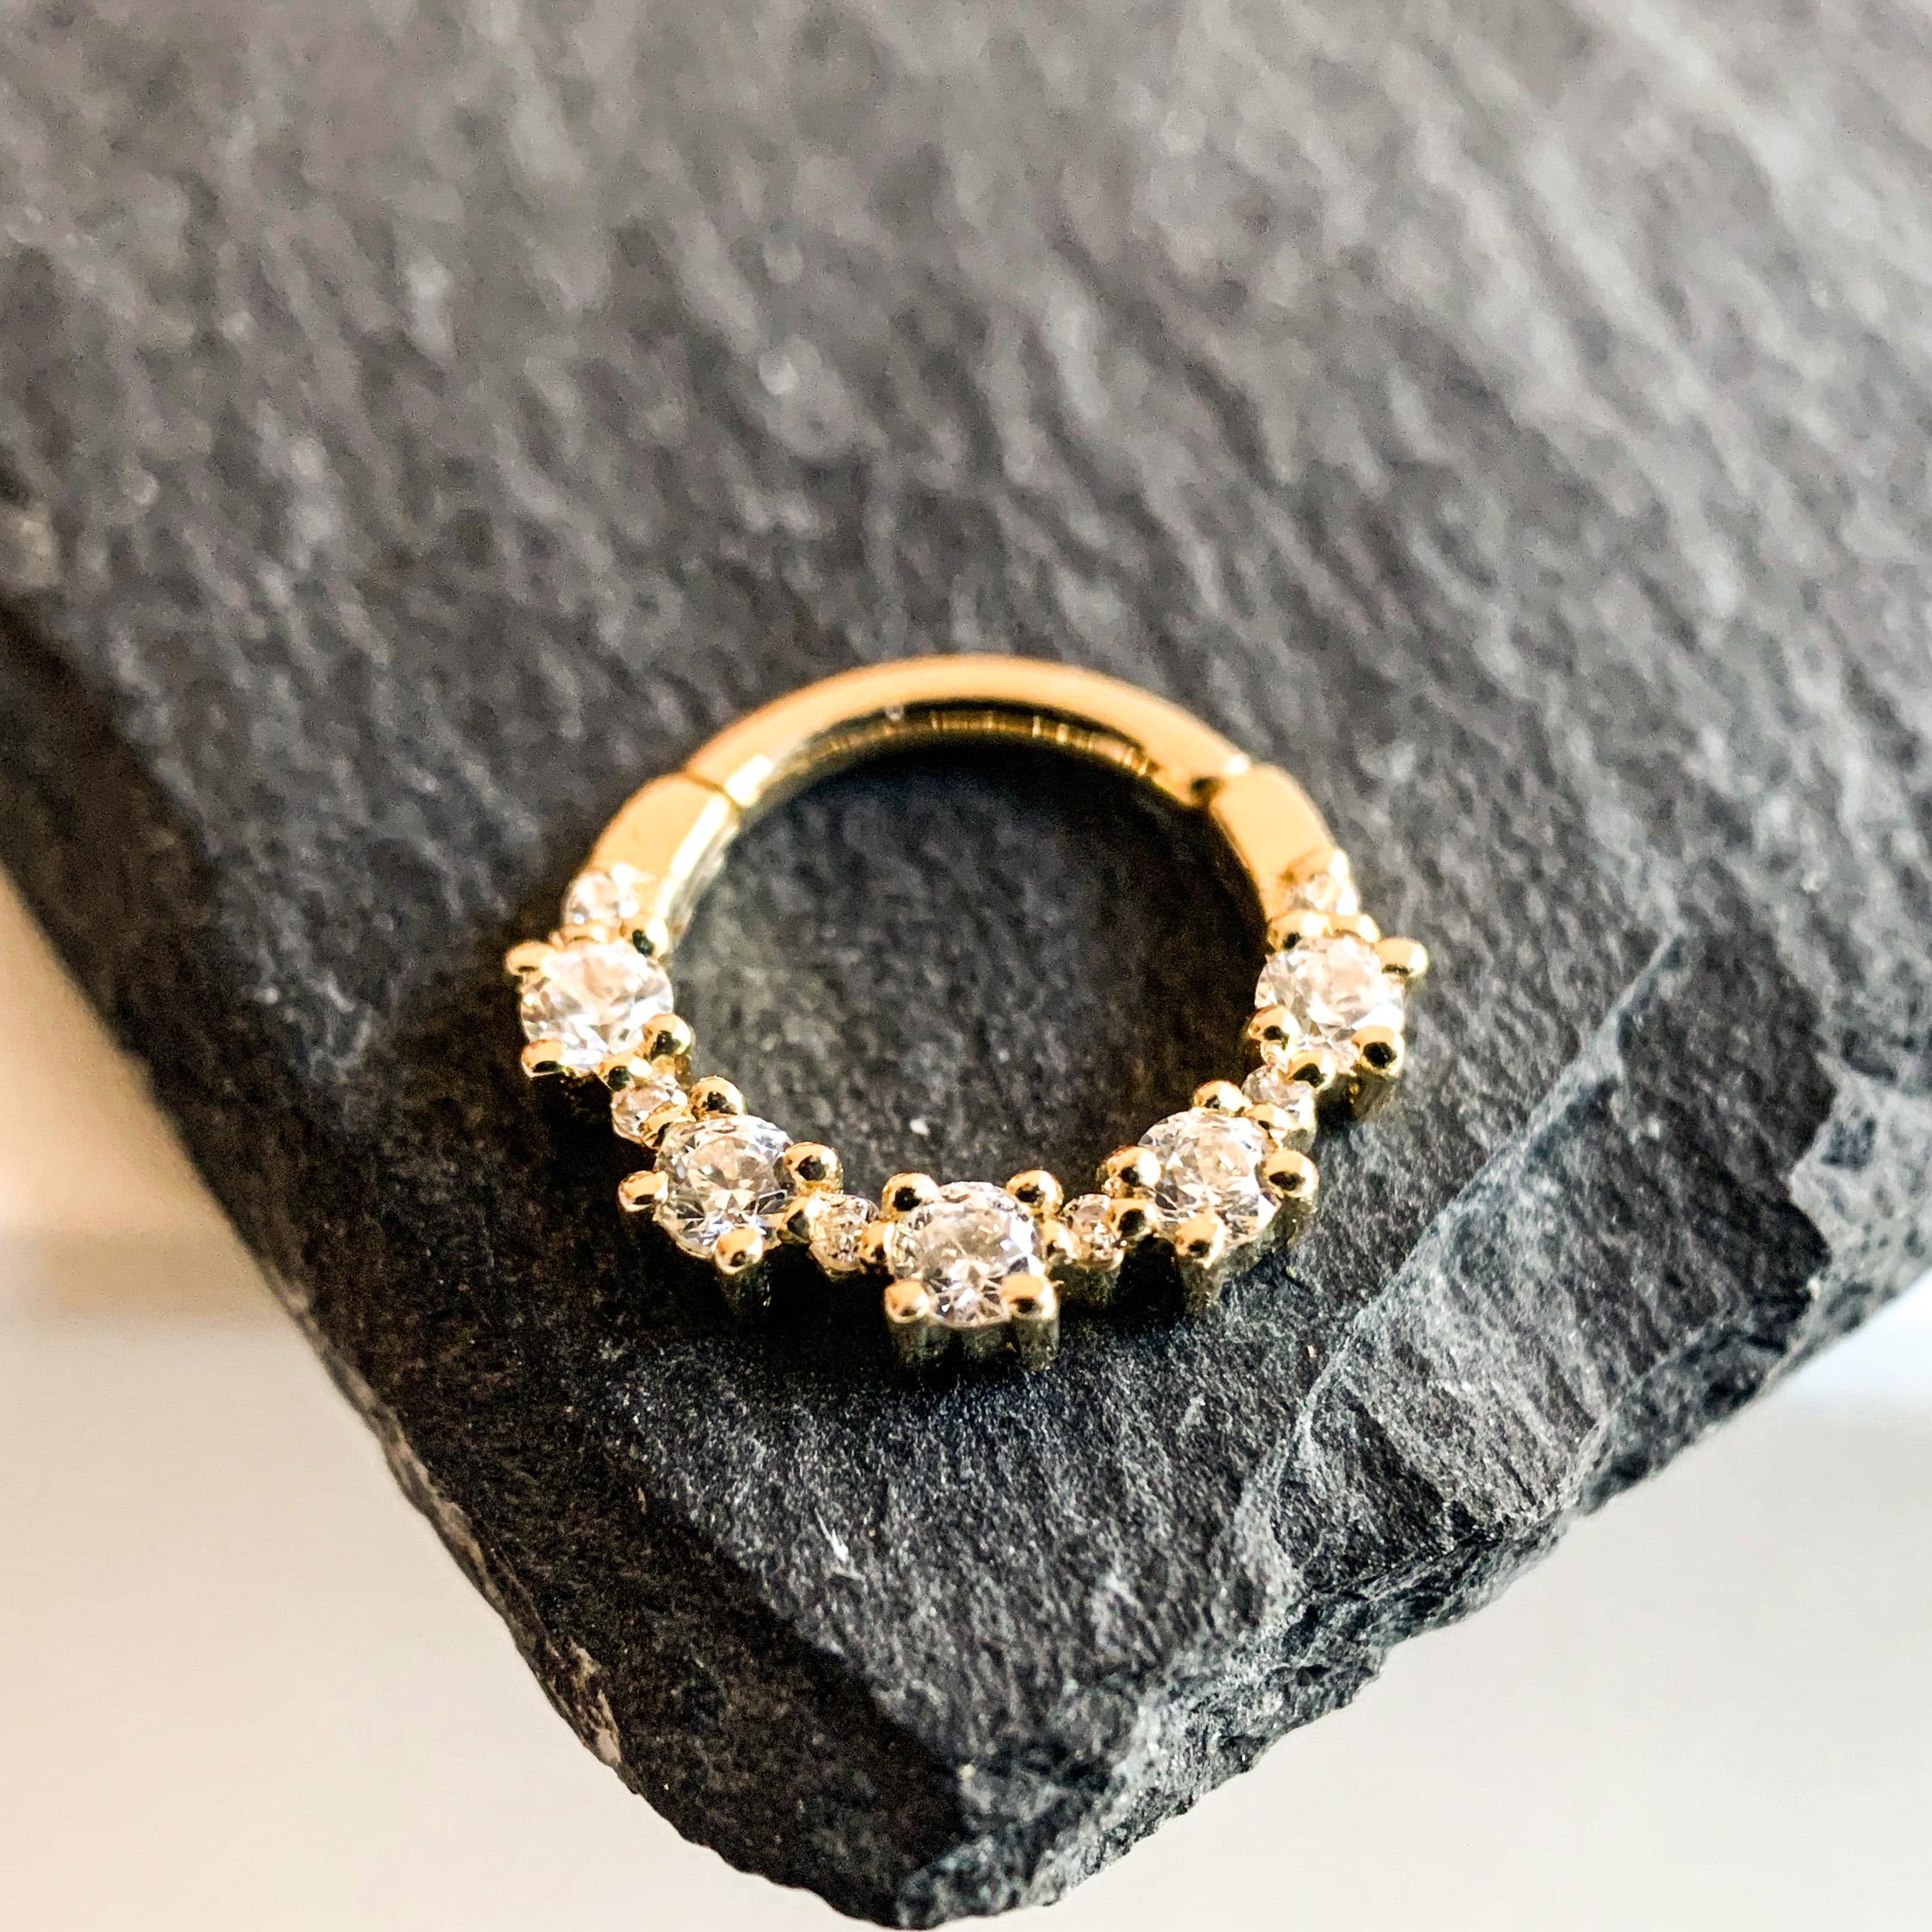 BVLA 14k Echtgold Ring Setevos